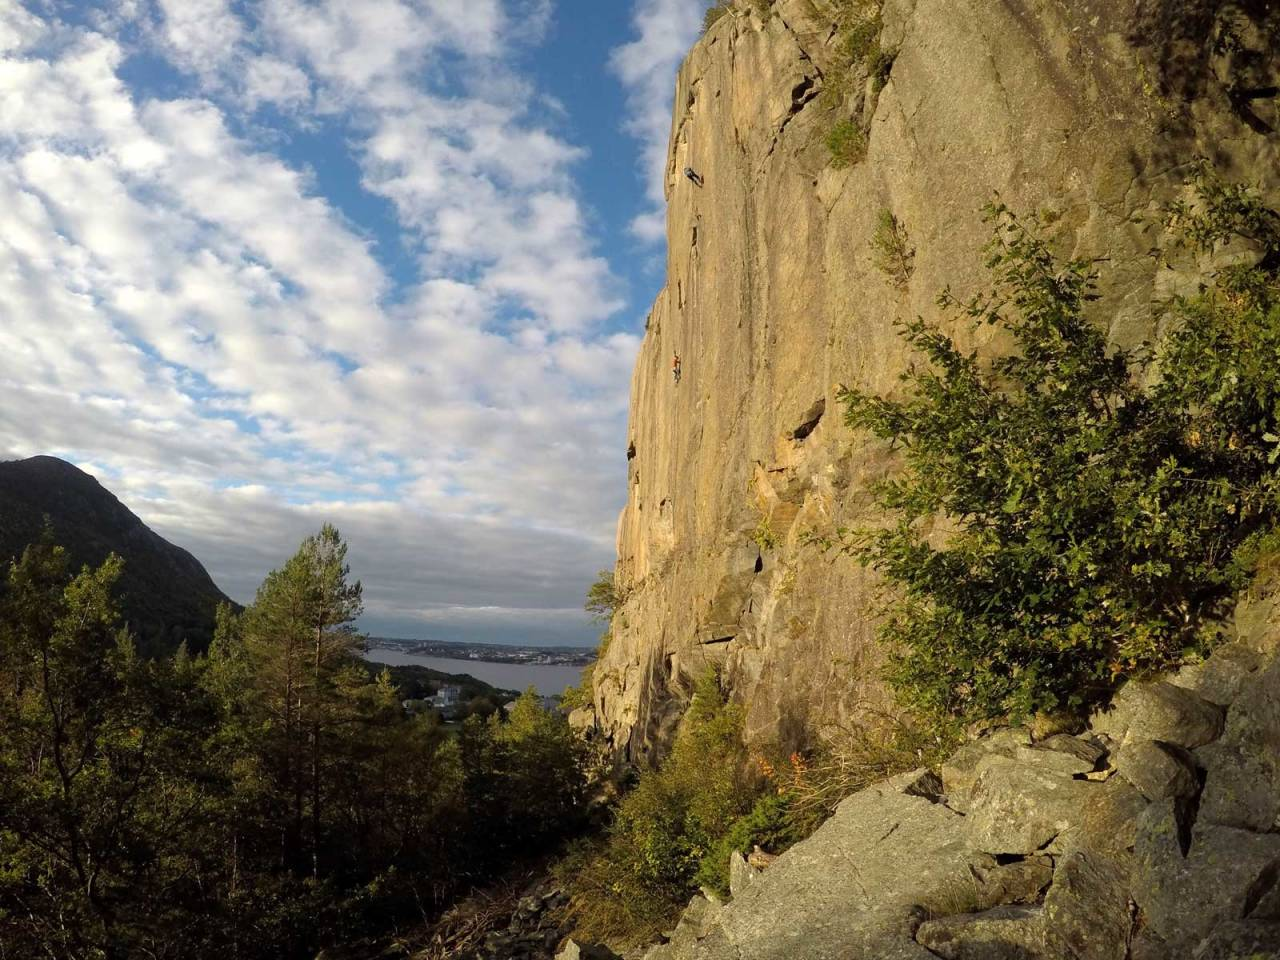 Integralen: Jon Egil Auestad klatrer Imperiet (7+) på Dale, med Leiv Aspelund hengende på det klassiske Valhalla-risset mens han tar bilder. Foto: Auestad (selfie med gopro)